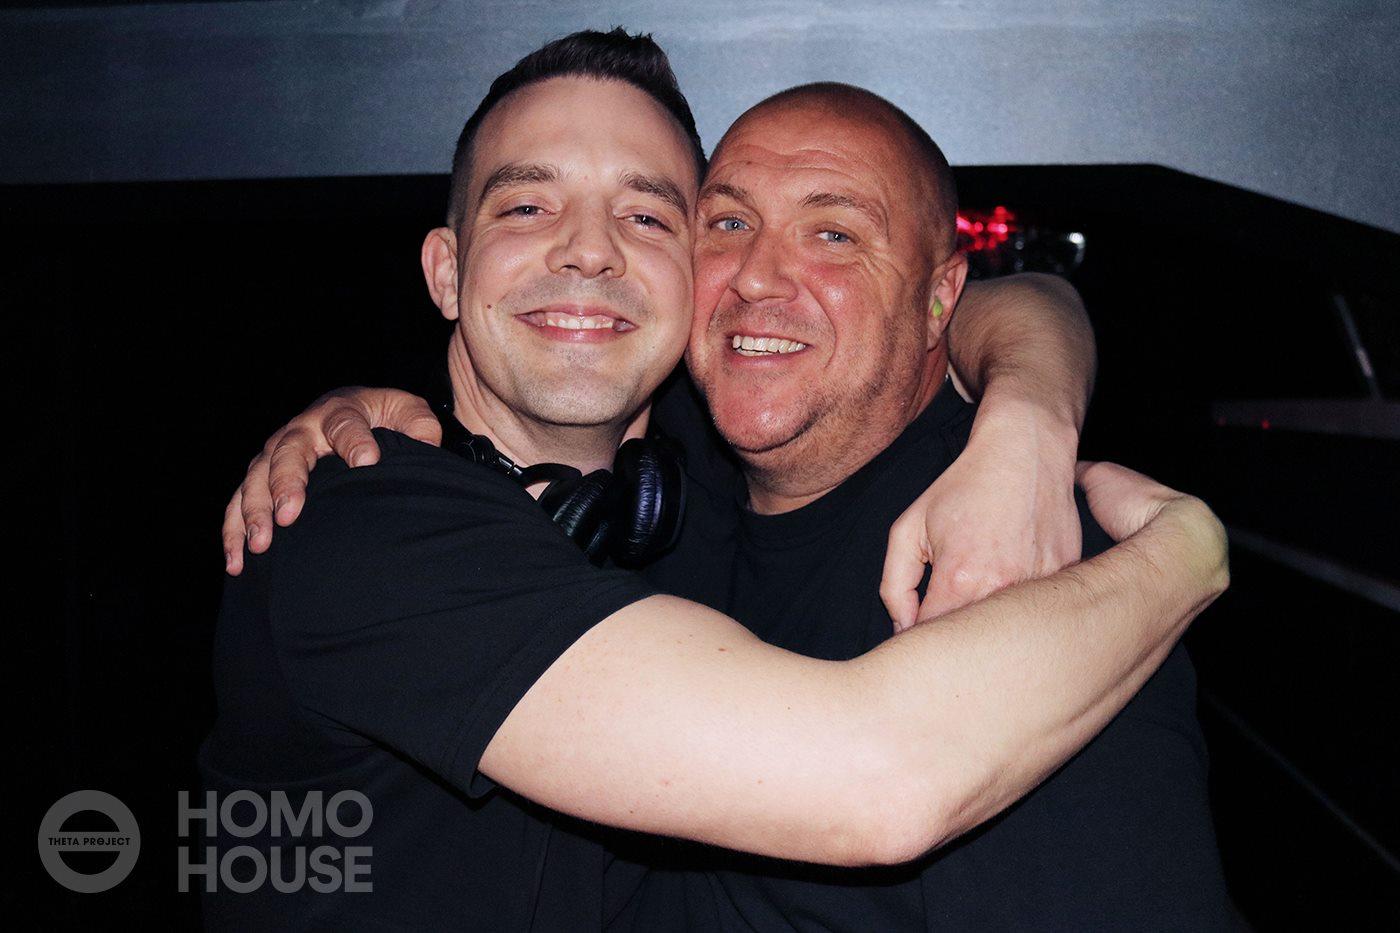 Jordan Eskra with Bobby Blanco